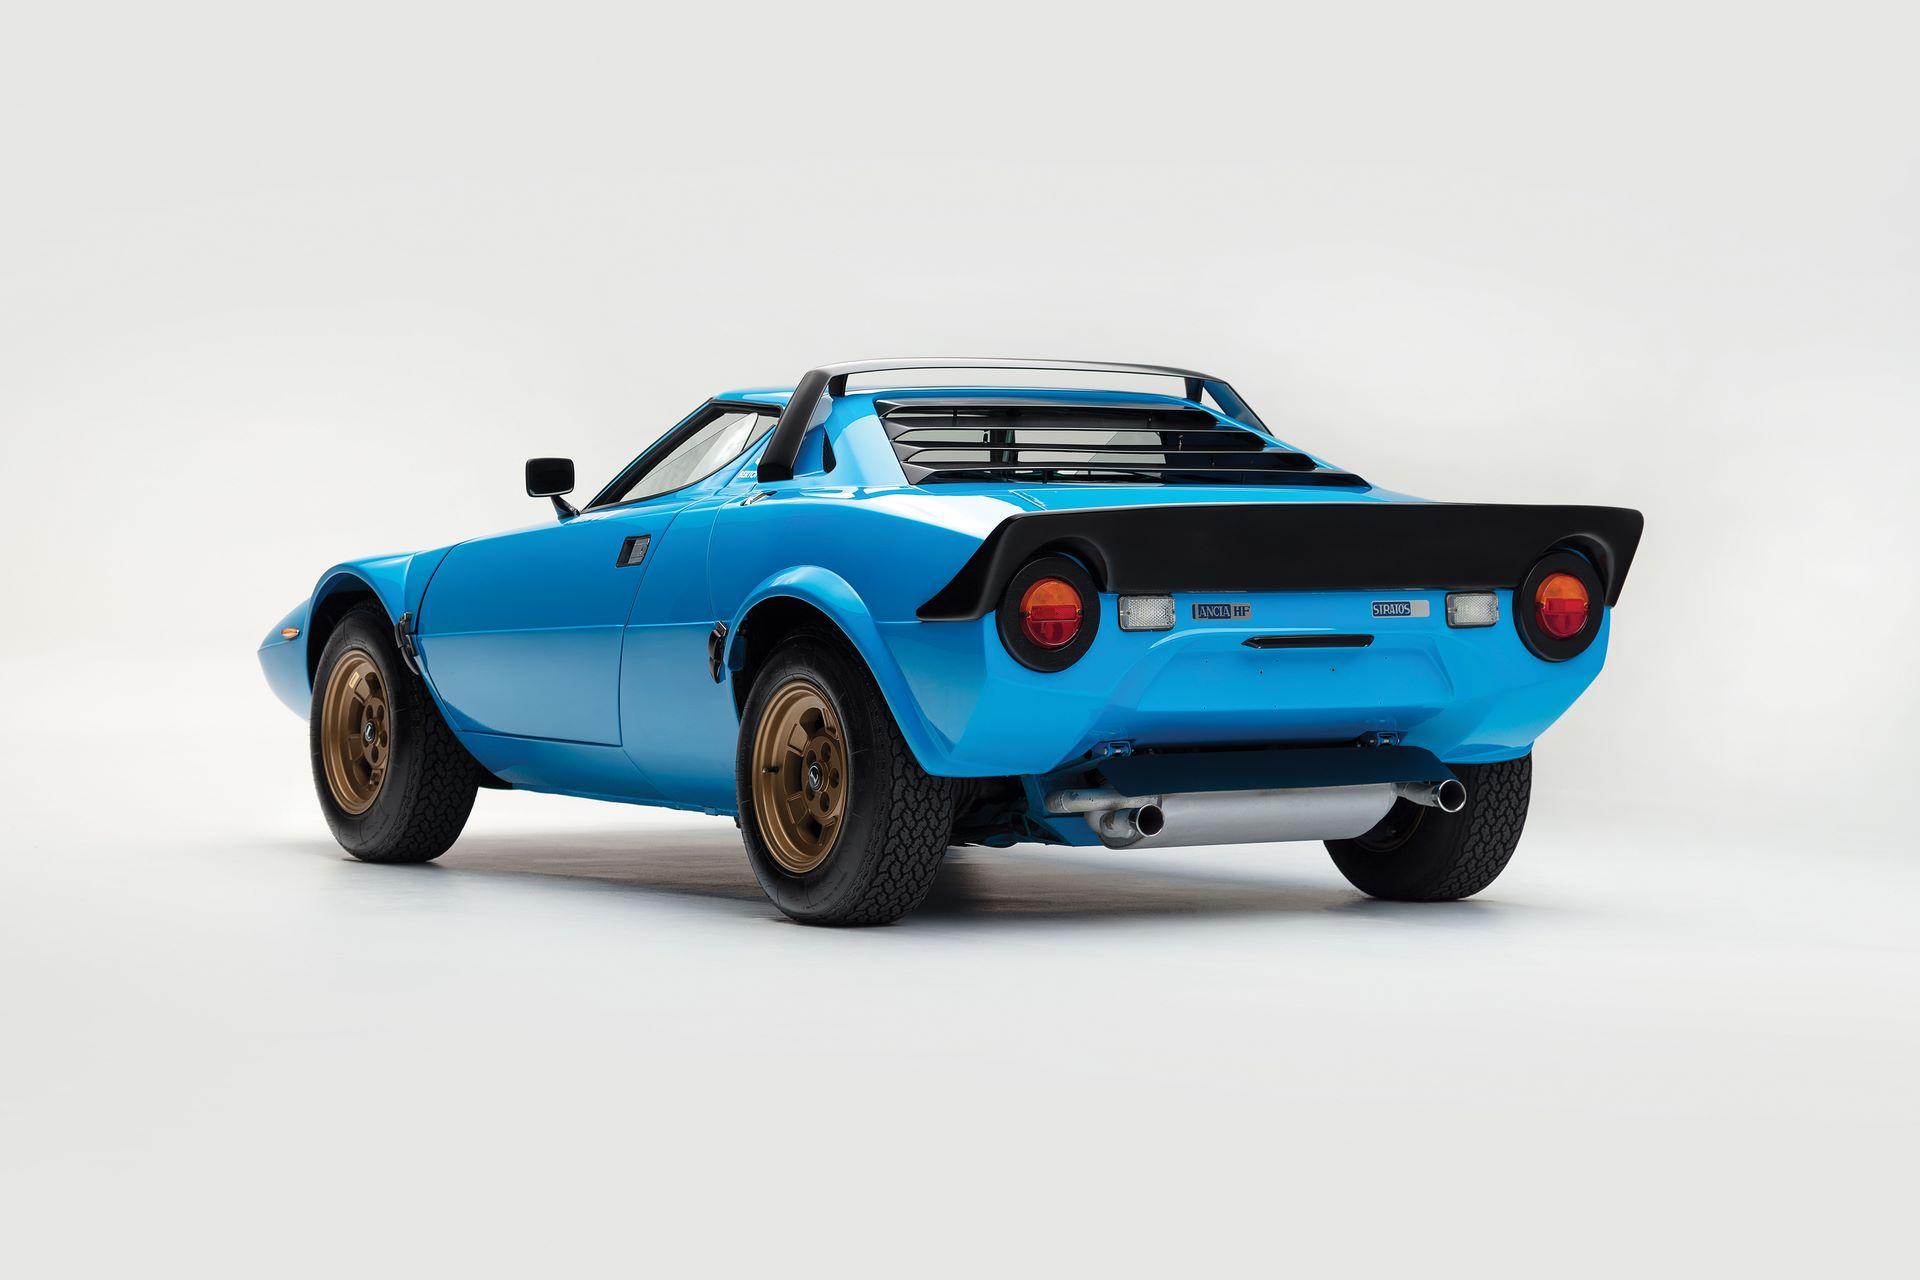 1975-Lancia-Stratos-HF-Stradale-by-Bertone_1